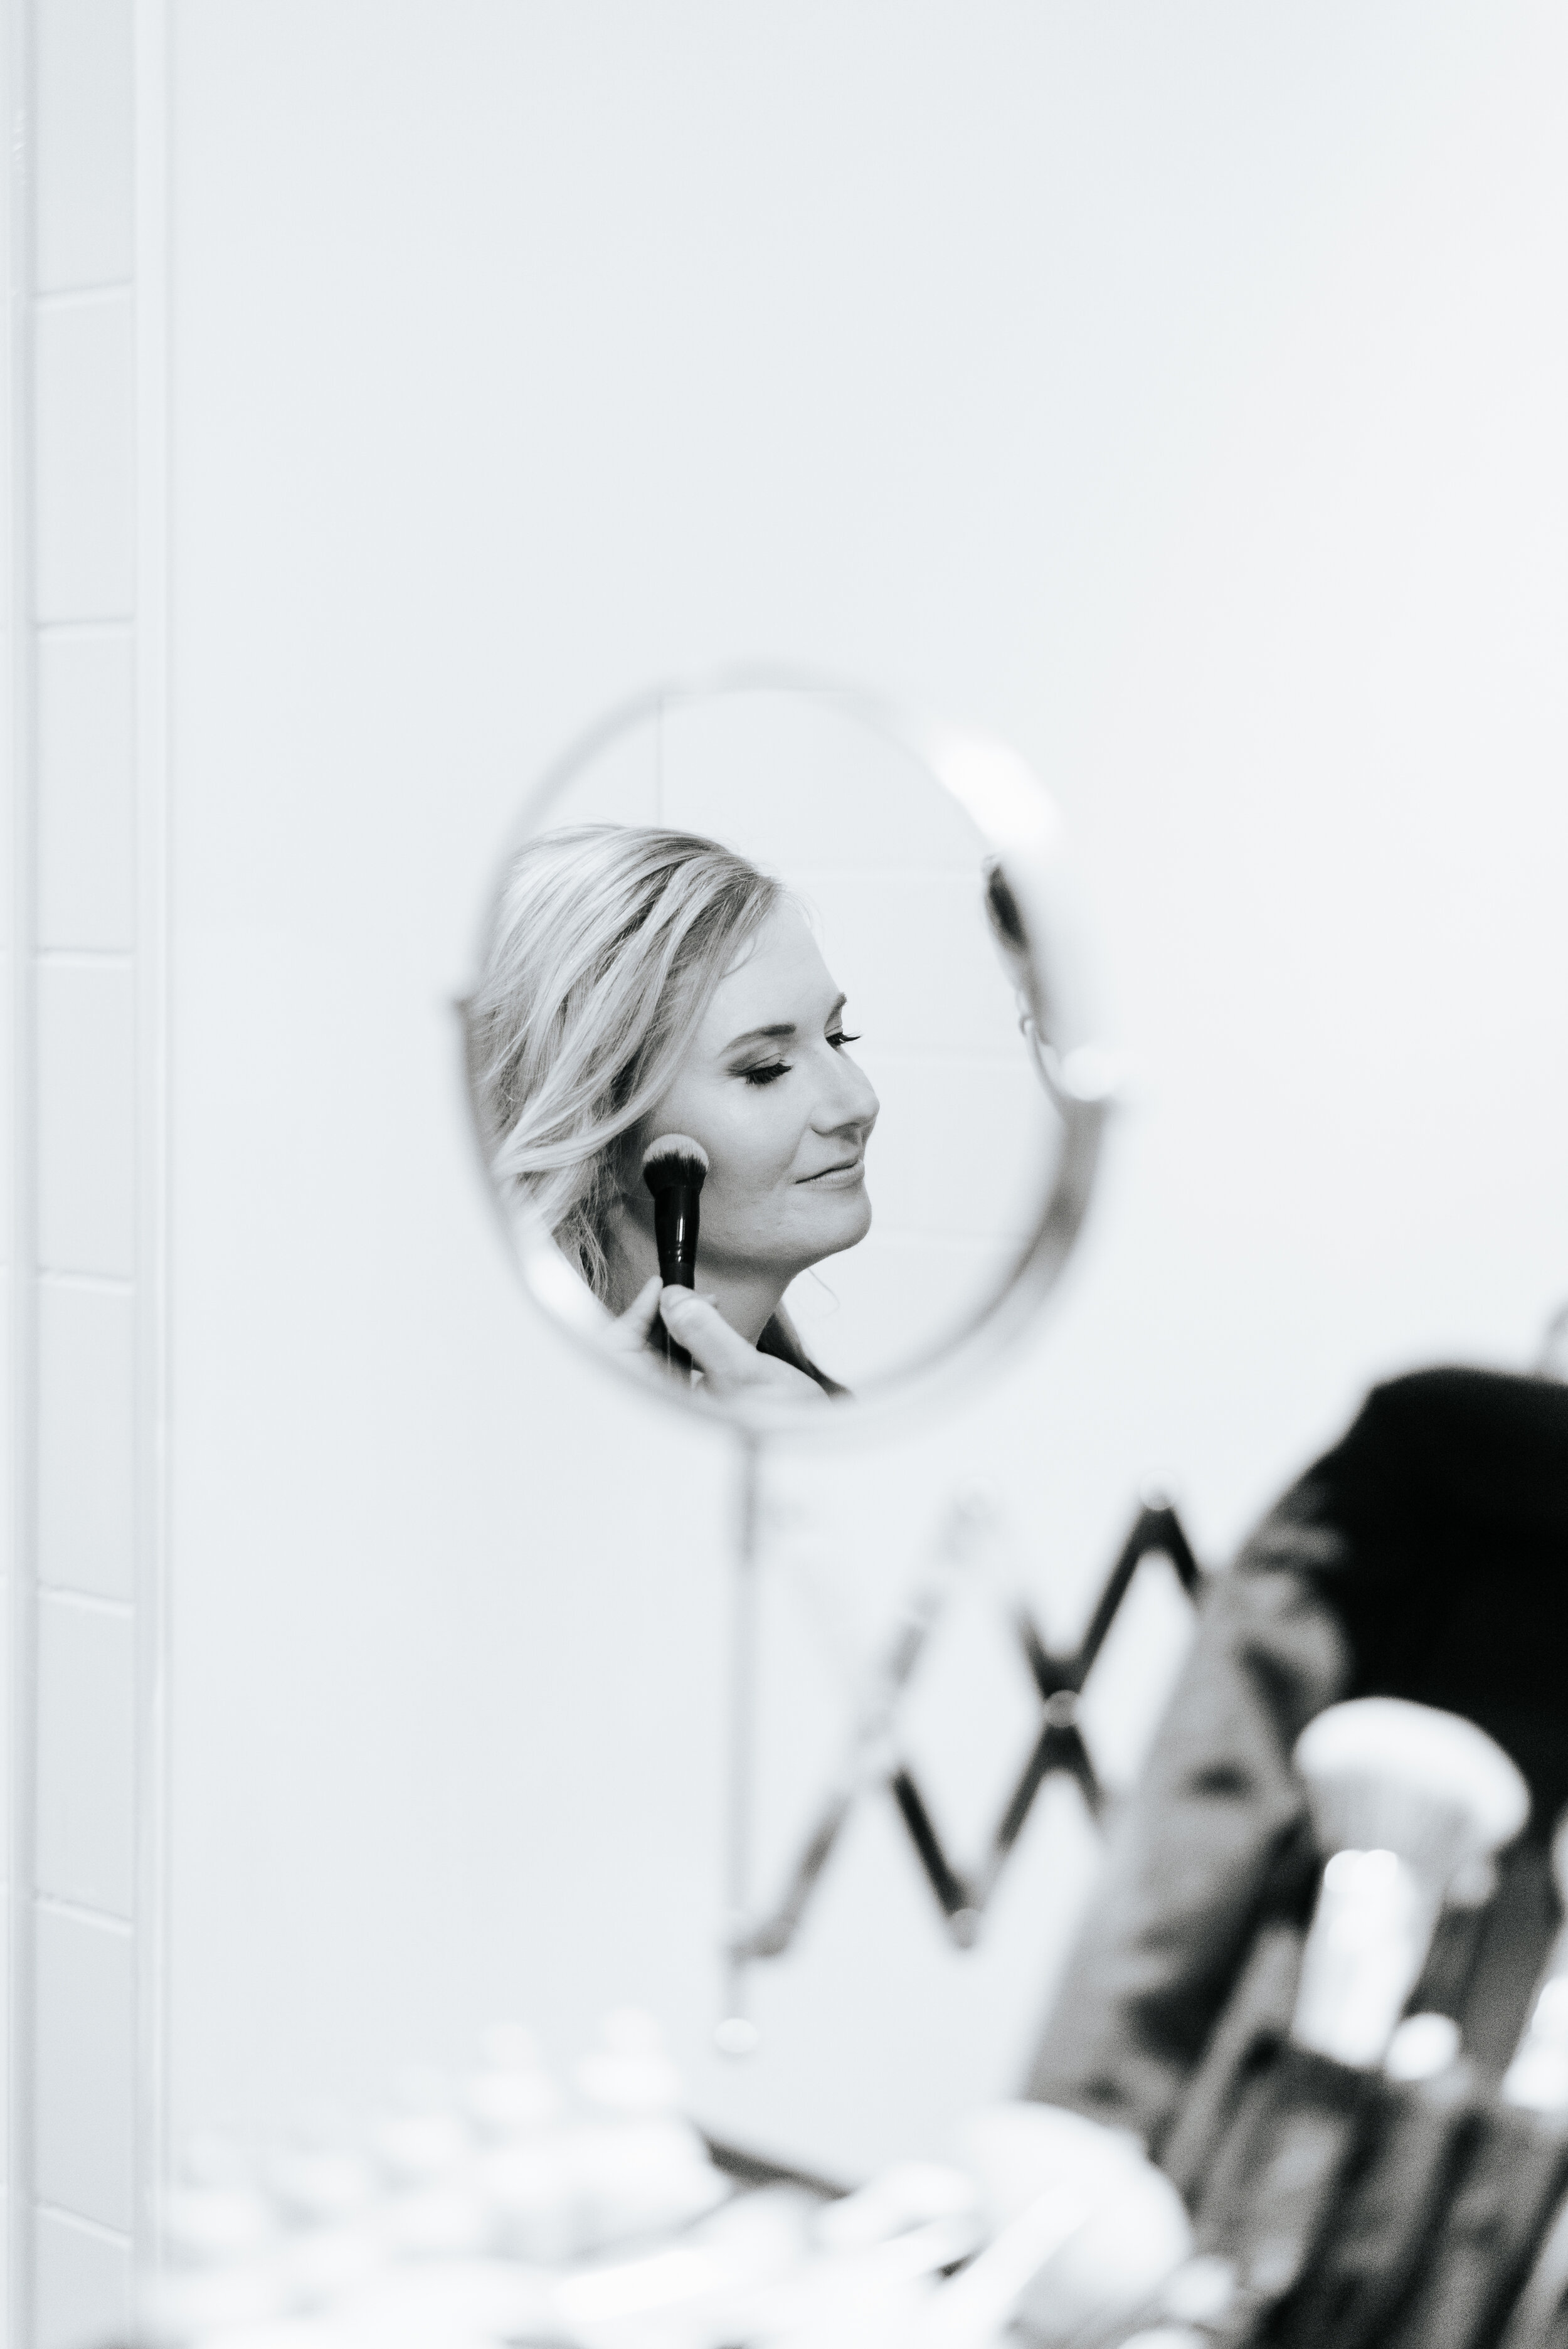 Cassie-Mrunal-Wedding-Quirk-Hotel-John-Marshall-Ballrooms-Richmond-Virginia-Photography-by-V-4.jpg